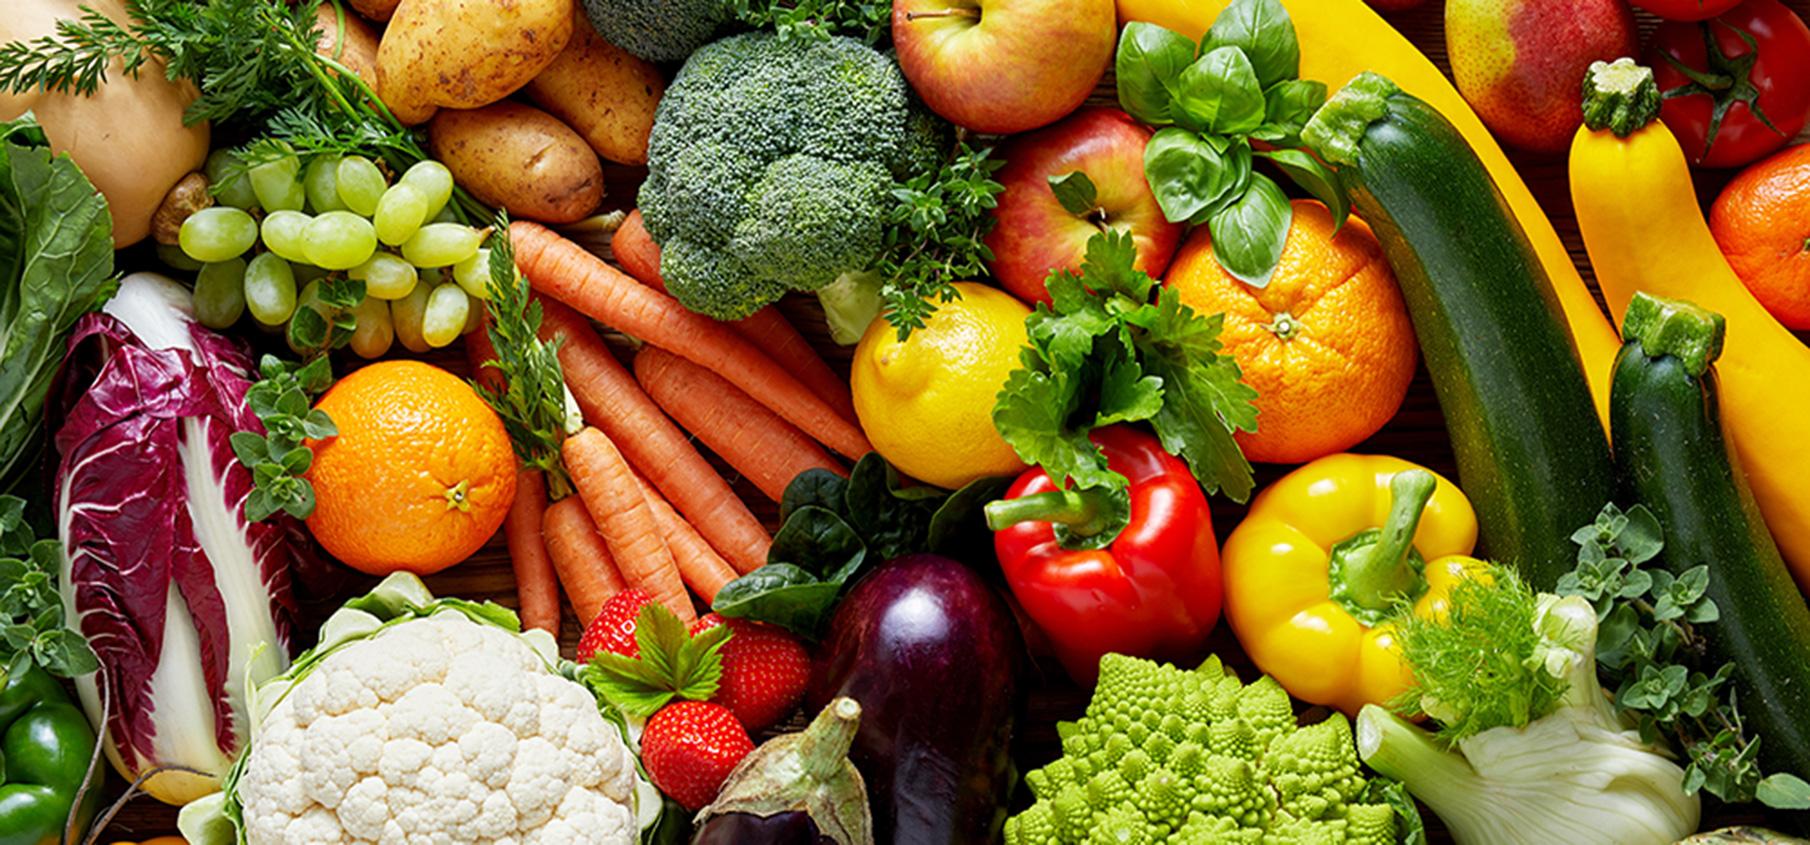 Fresh produce. Photo credit: Adobe Stock